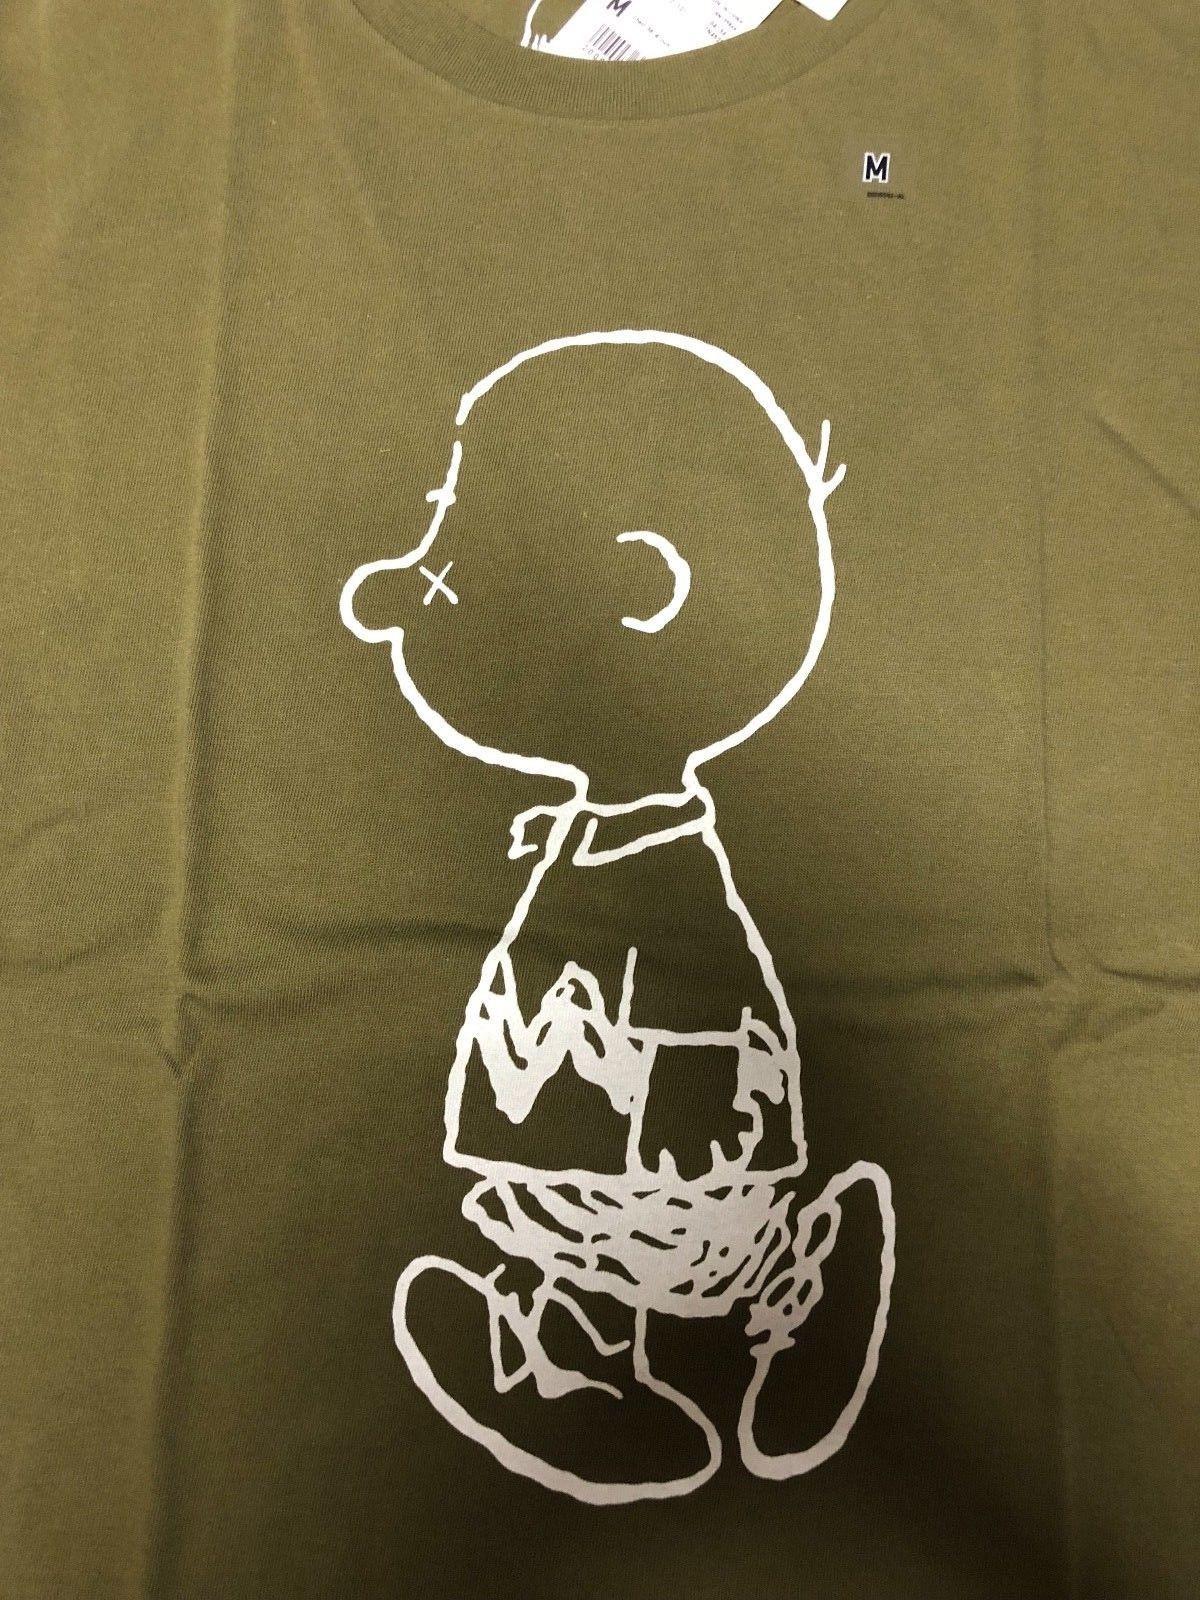 1ea8d1d9826dba Uniqlo X Kaws Peanuts Snoopy Olive Graphic T Shirt US Size M NWT Charlie  Brown Men Women Unisex Fashion Tshirt Awesome T Shirt Designs Tea Shirts  From ...